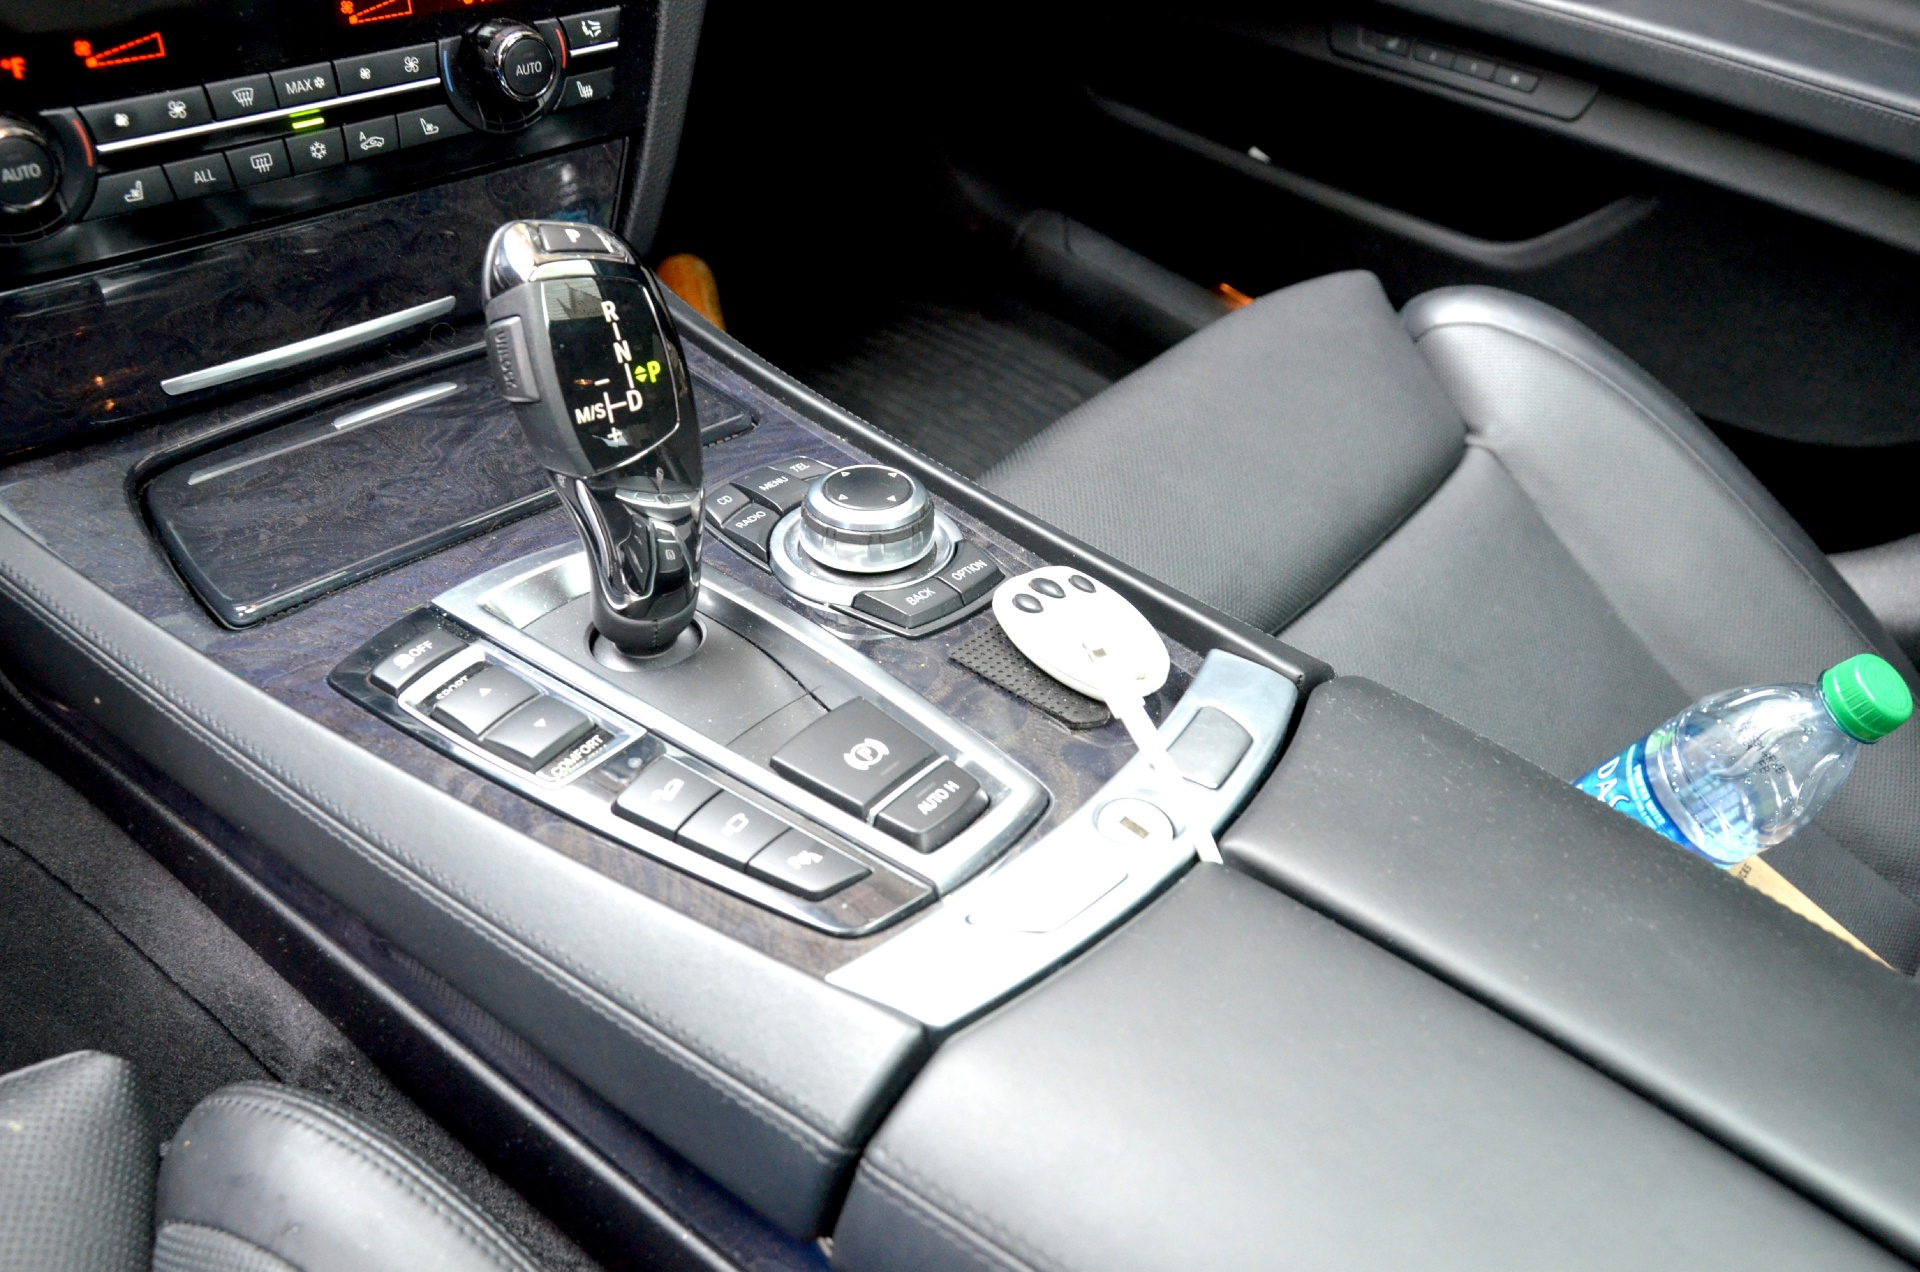 2012 Bmw 7 Series 750li Xdrive Stock 36961 For Sale Near